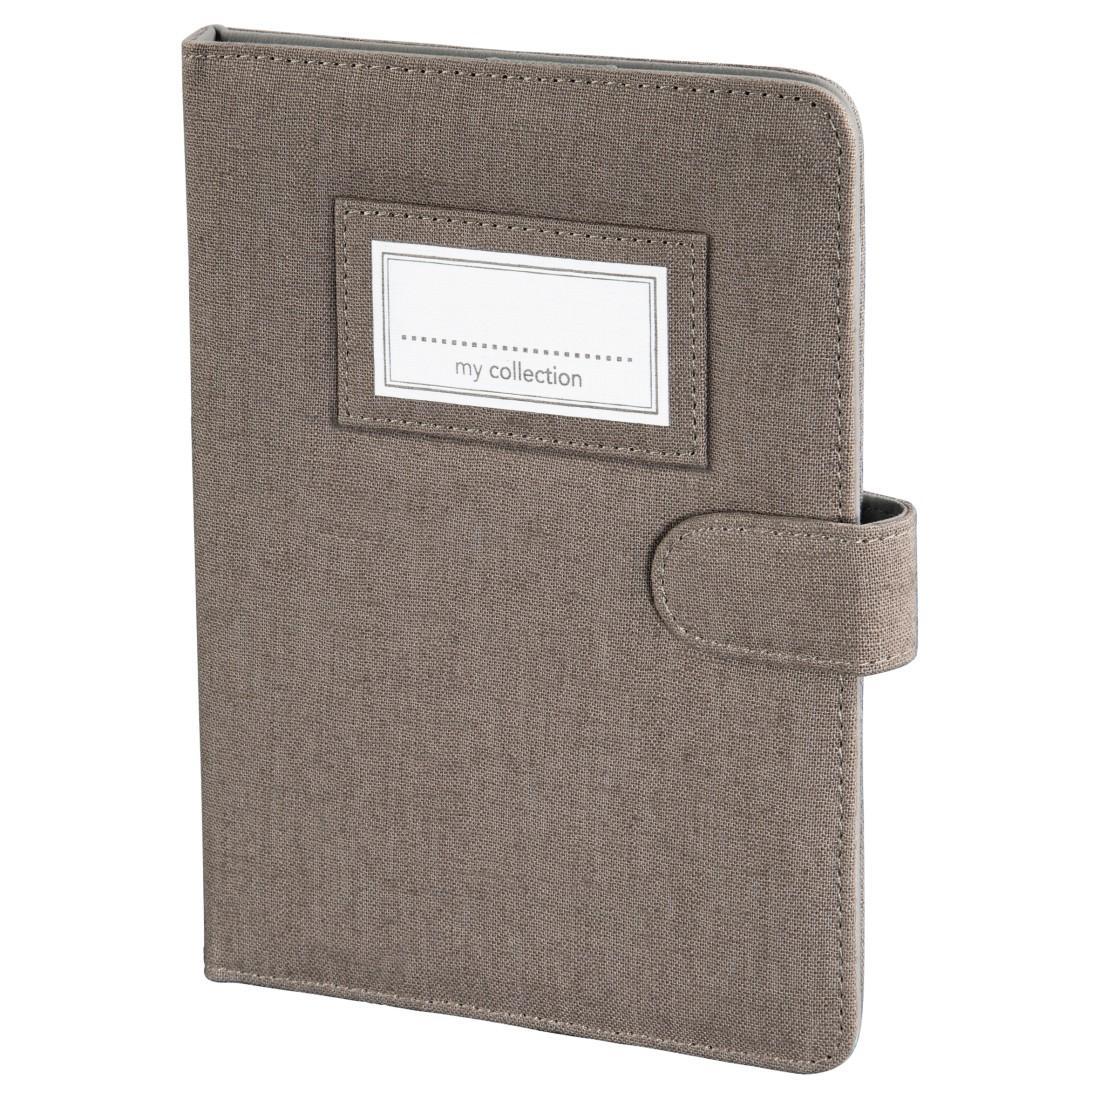 Калъф HAMA Linen за eBook четец, 6 inch, Kафяв